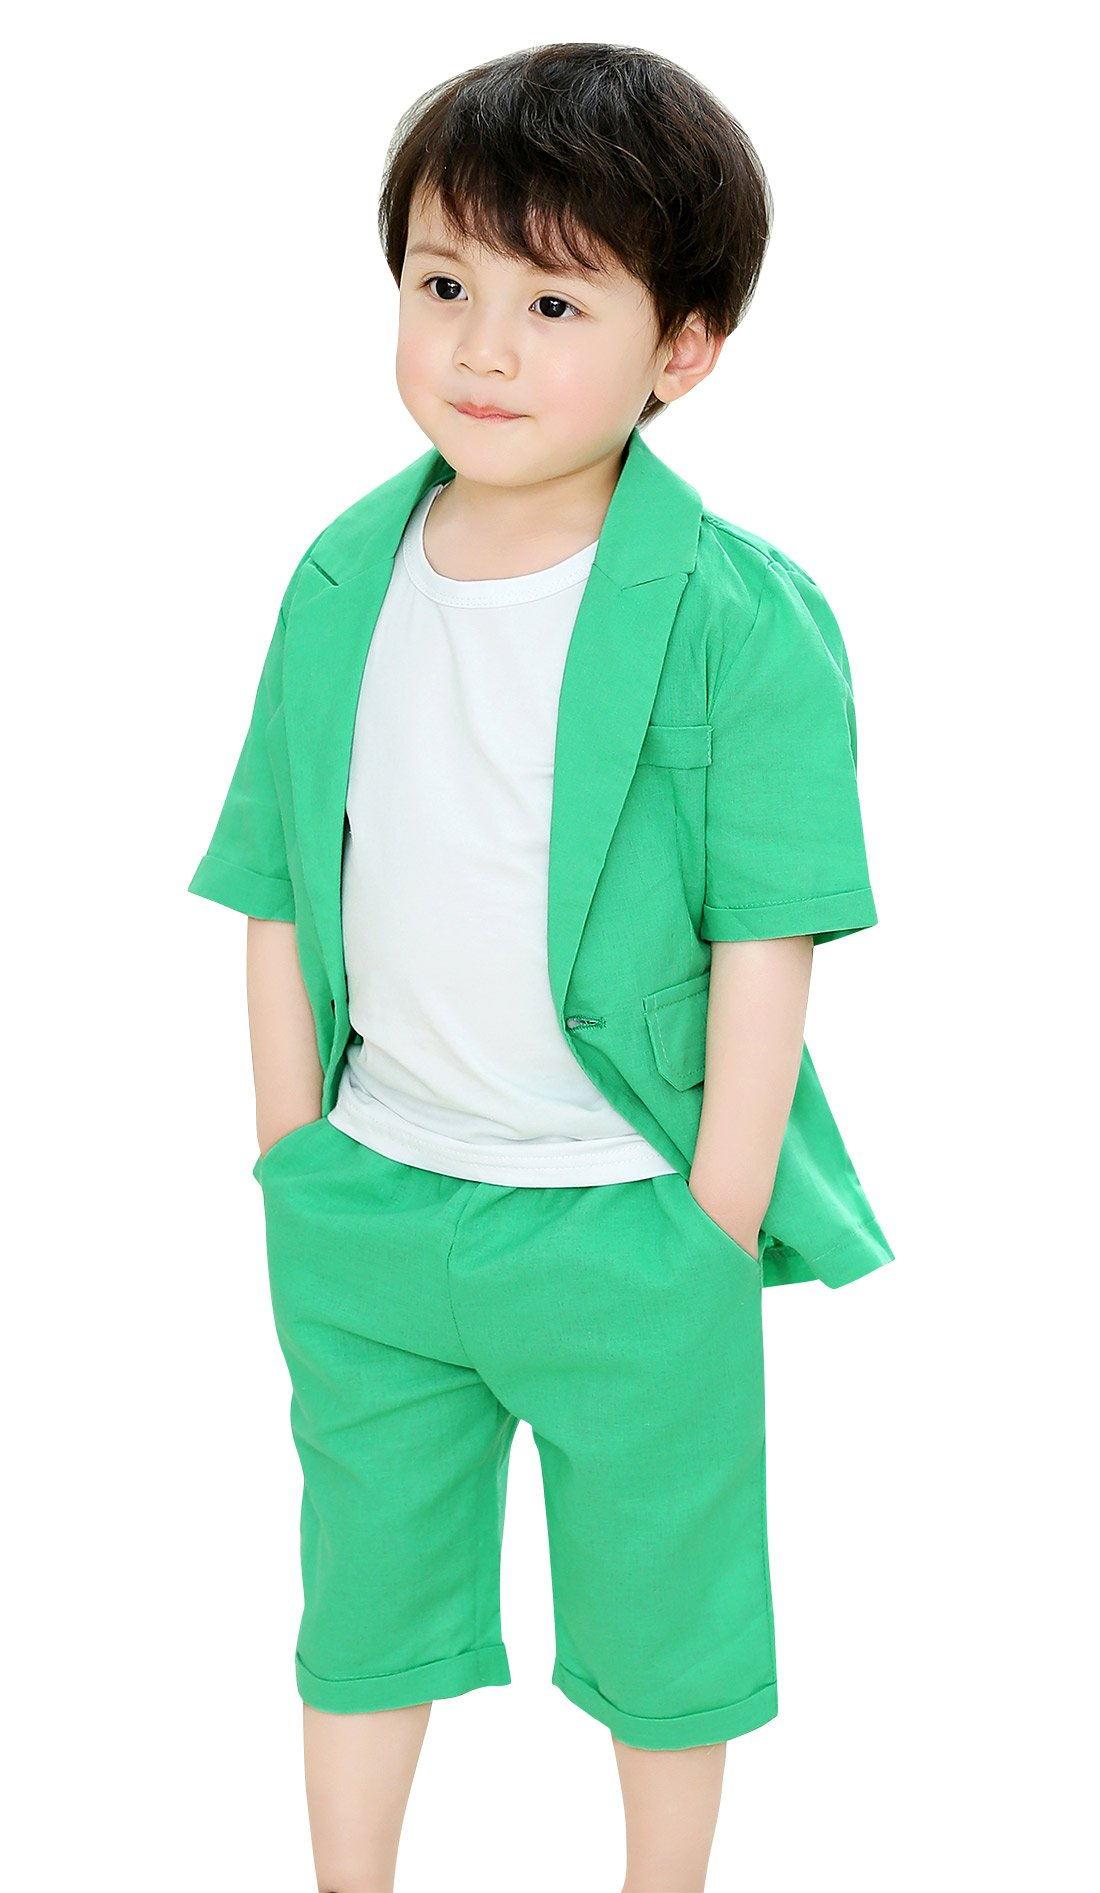 Boys Formal Summer Suit Set 2 Pieces Short Sleeve Jacket Shorts Wedding Green 4T